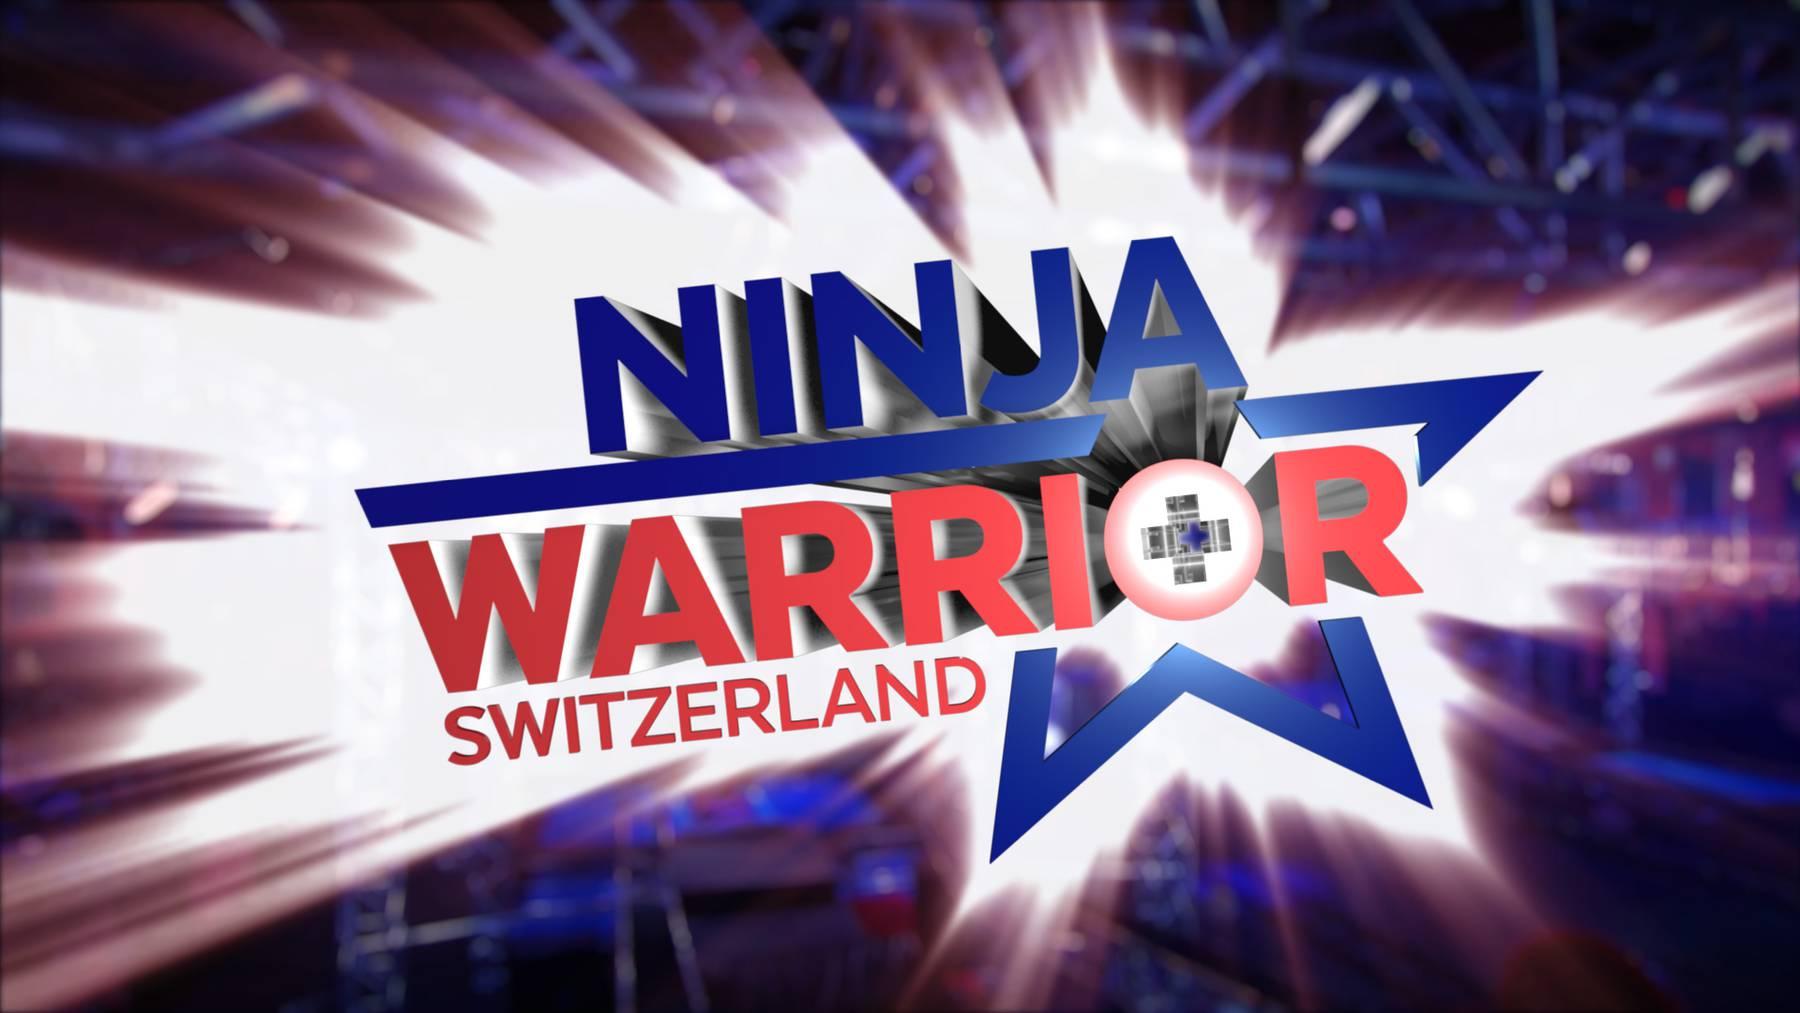 Ninja Warrior Switzerland